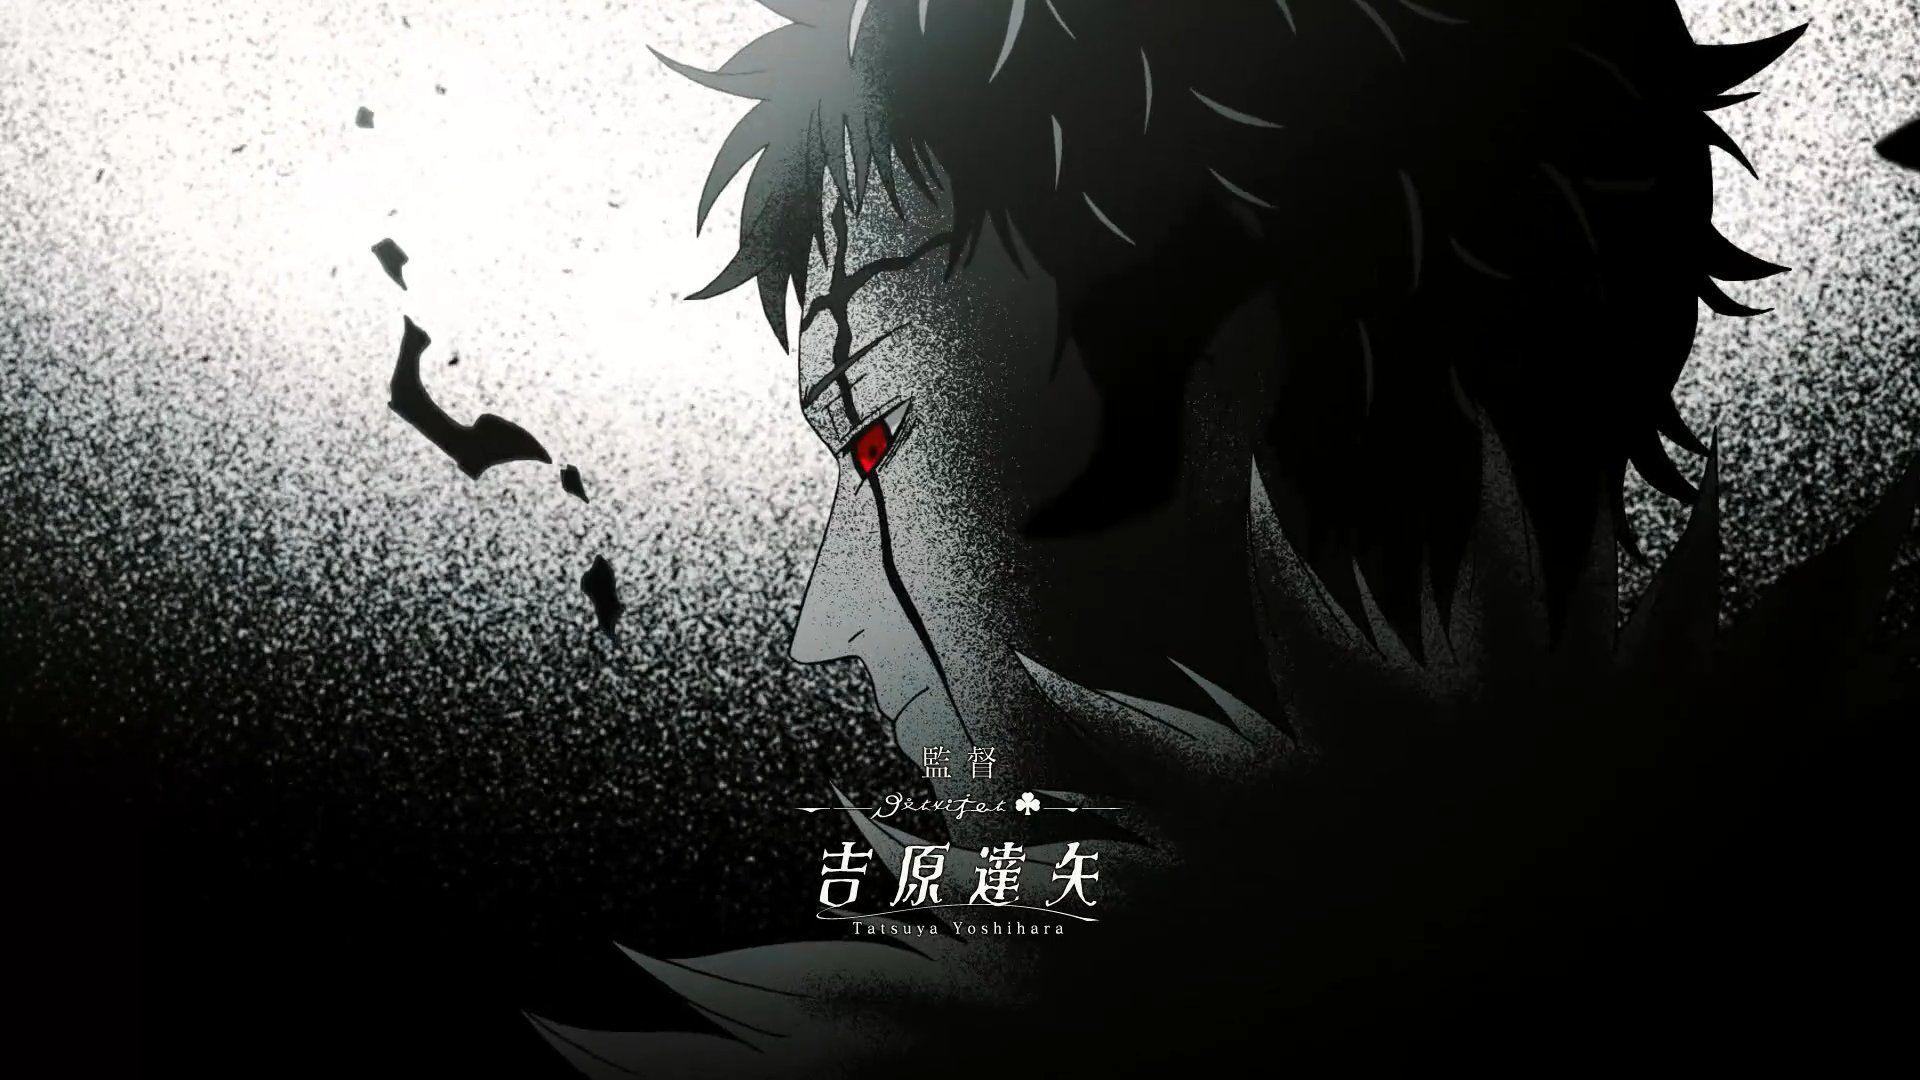 Black clover zenon zogratis anime dark triad hd wallpaper. Pin oleh Soranooke di Clover